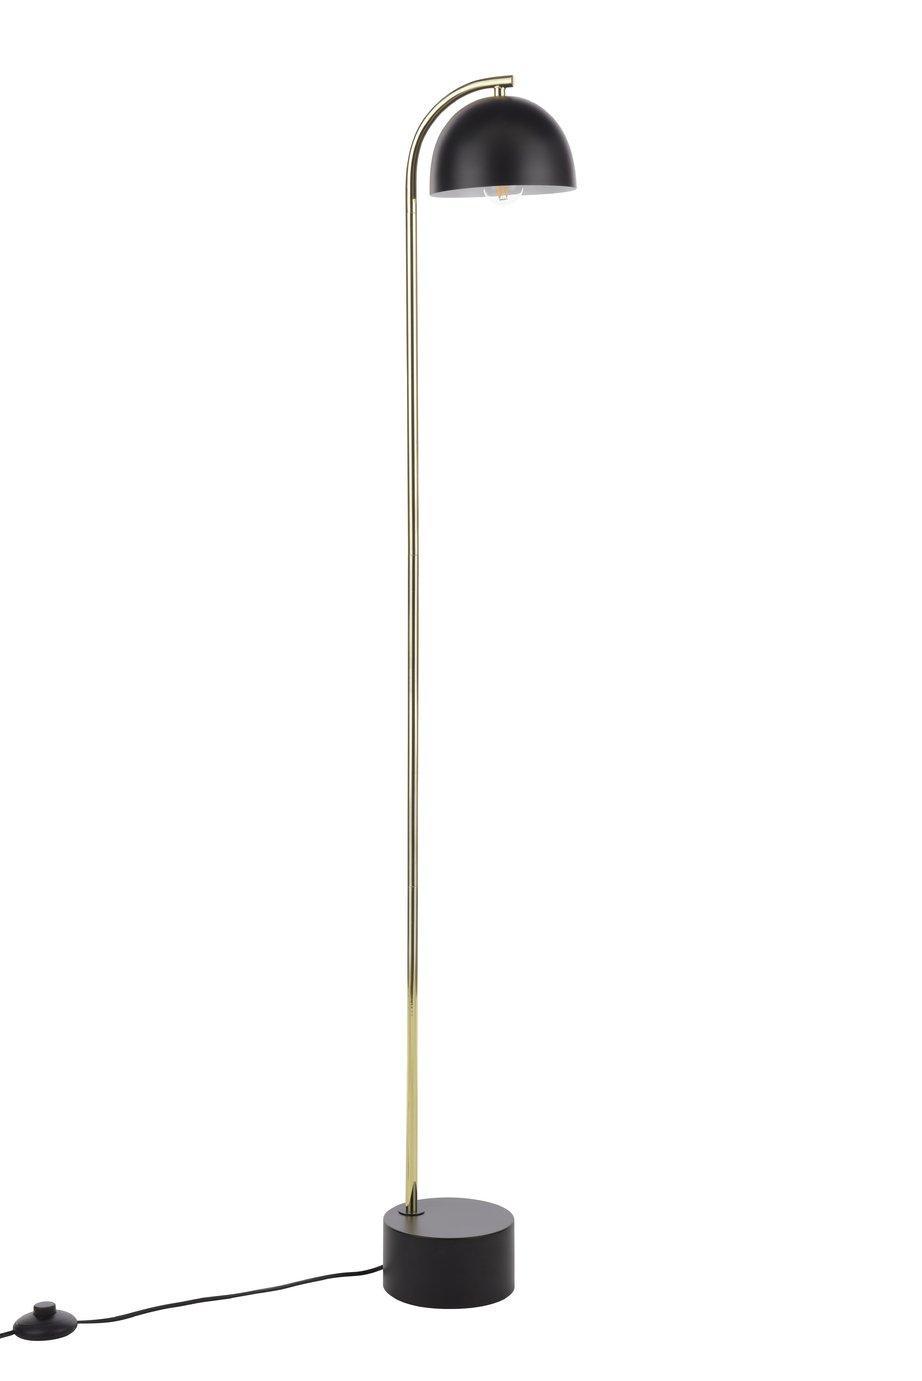 Habitat Ivar Floor Lamp - Black and Brass